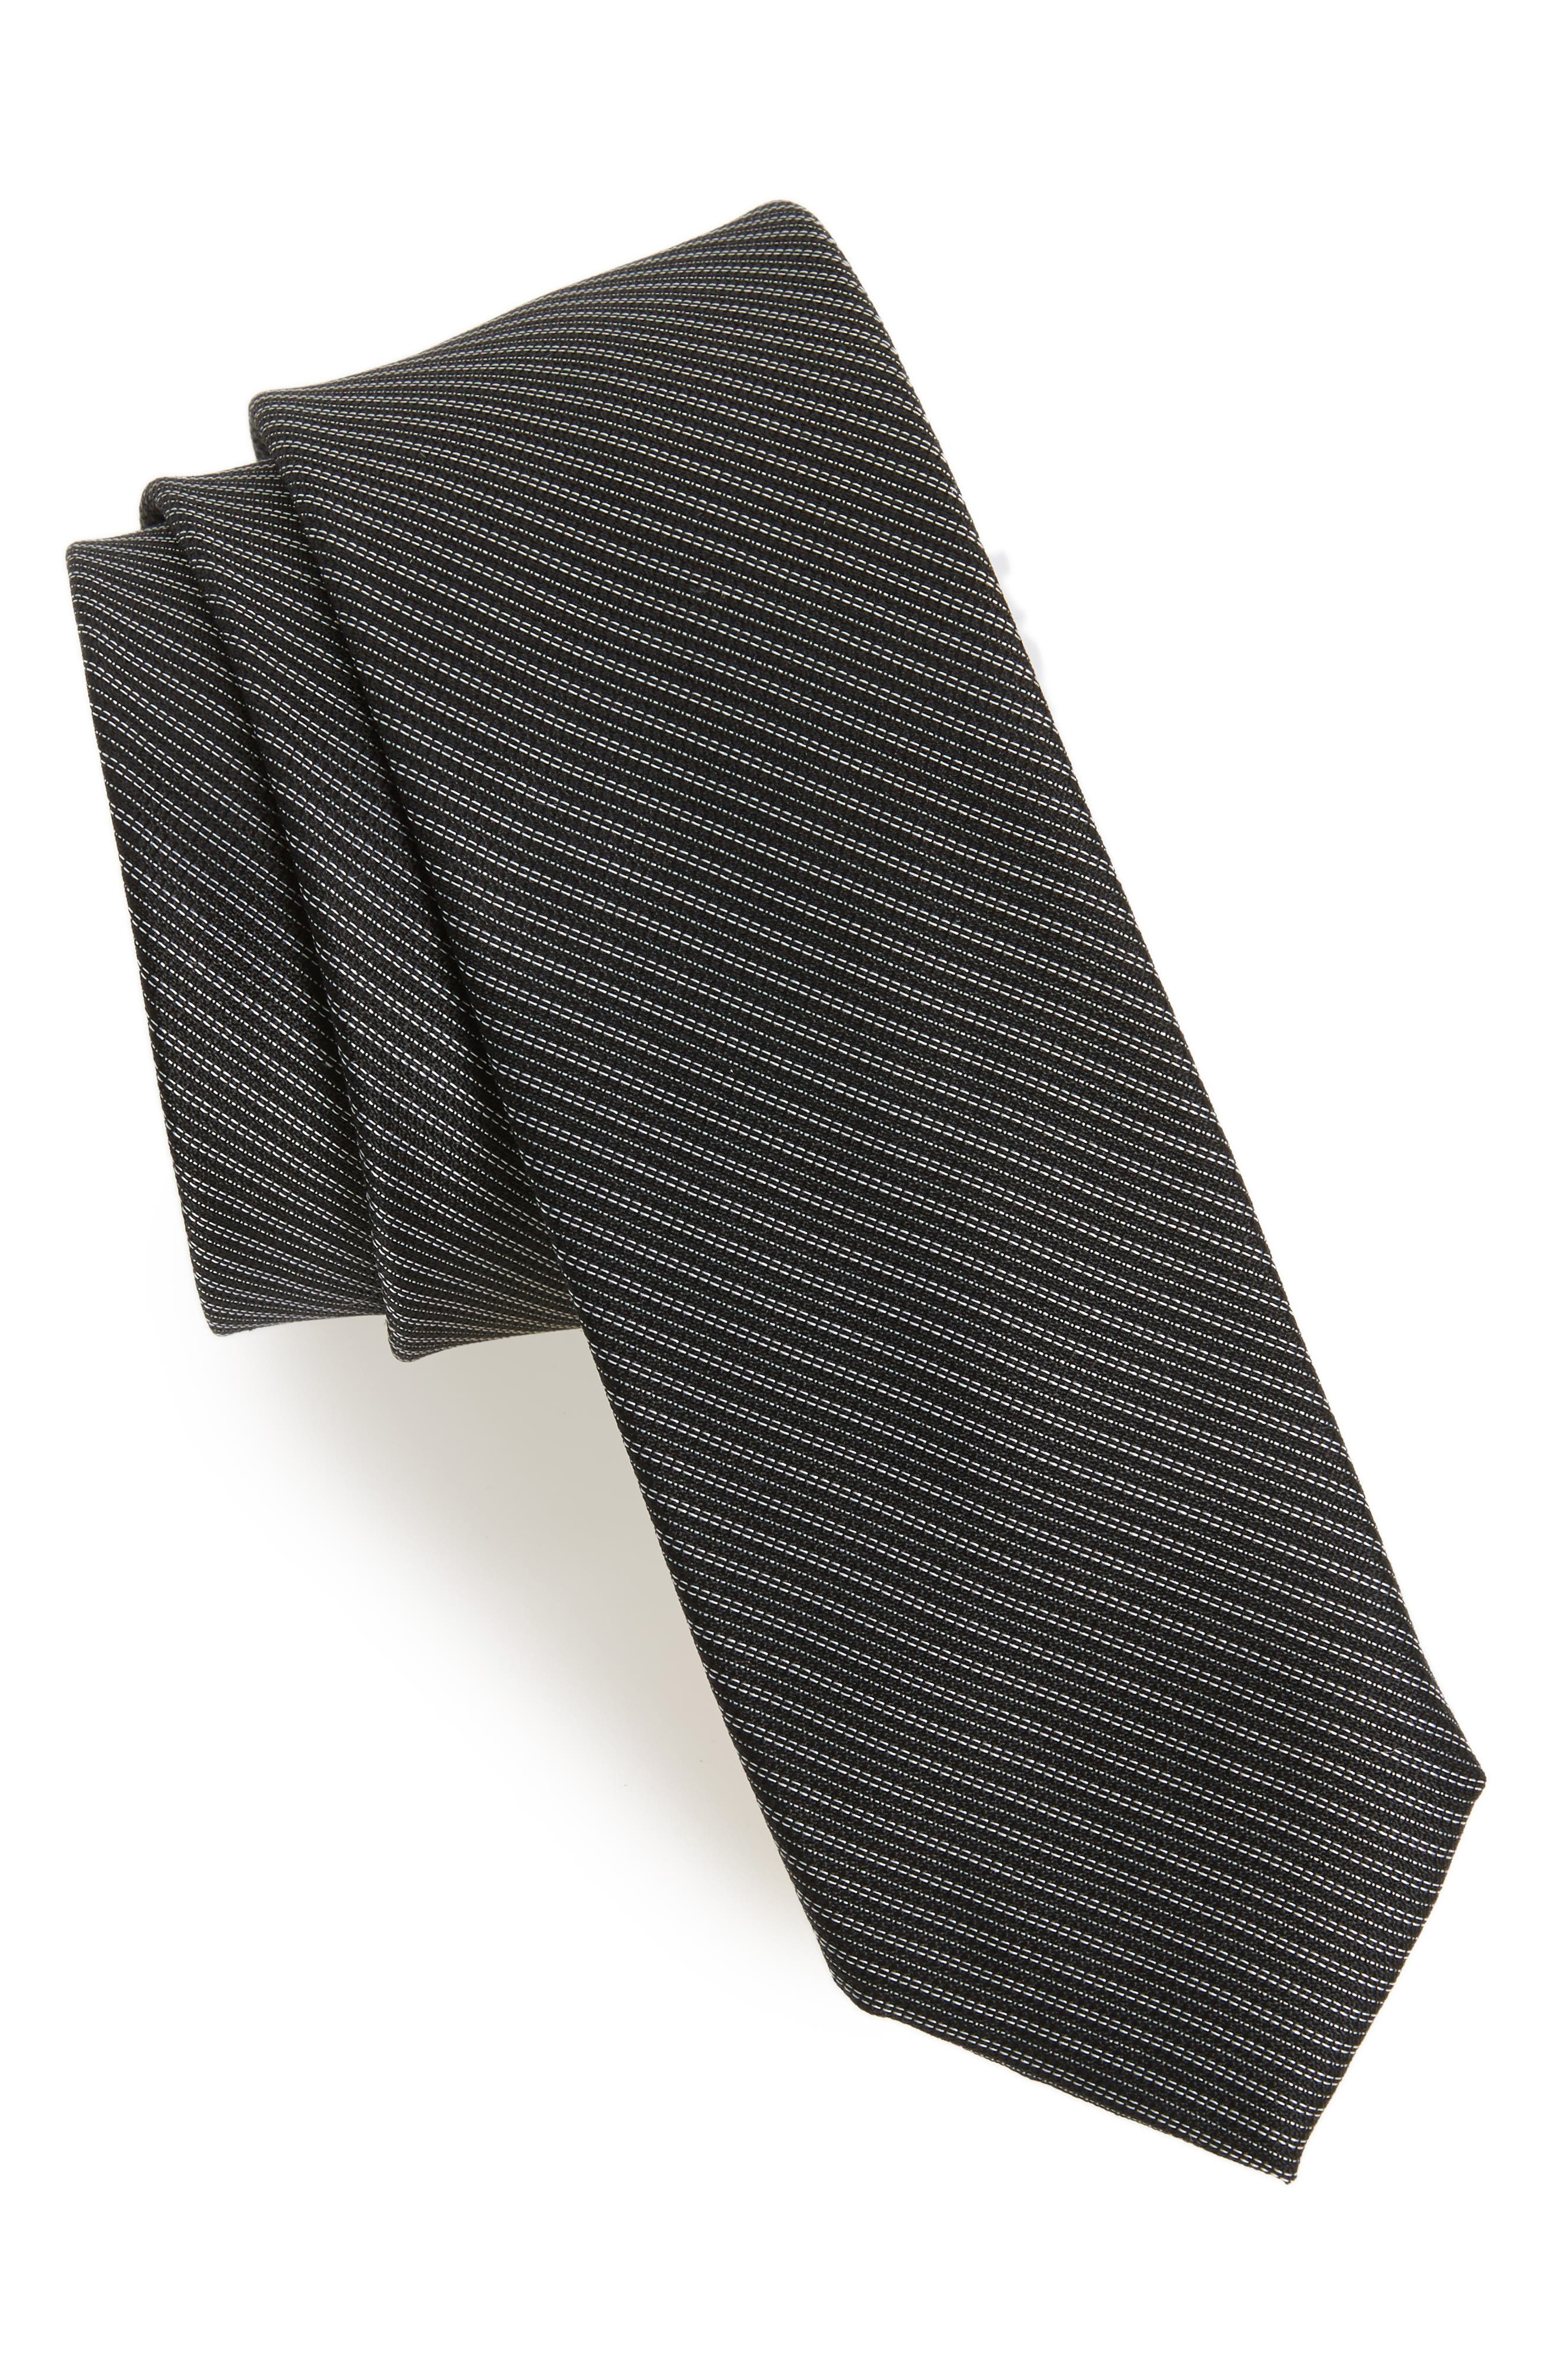 Black & White Silk Tie,                         Main,                         color, Black